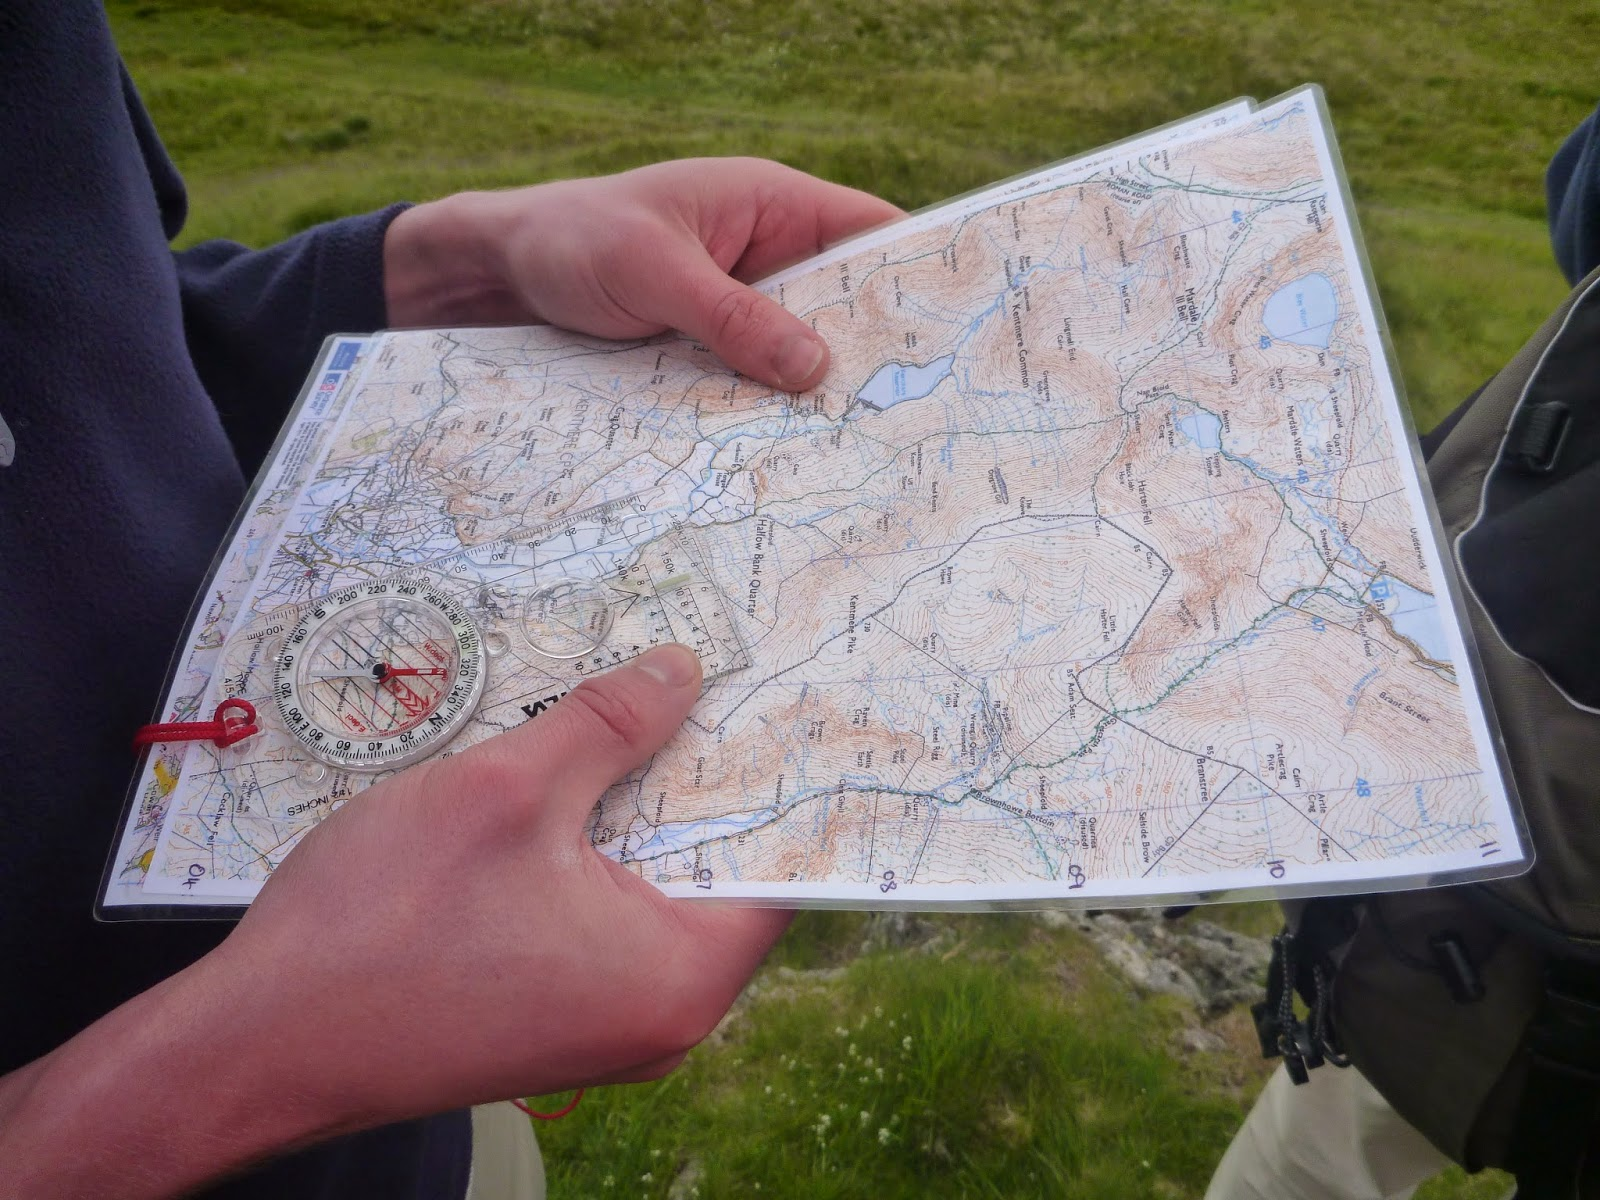 Outdoor Courses For Scrambling Climbing Kayaking